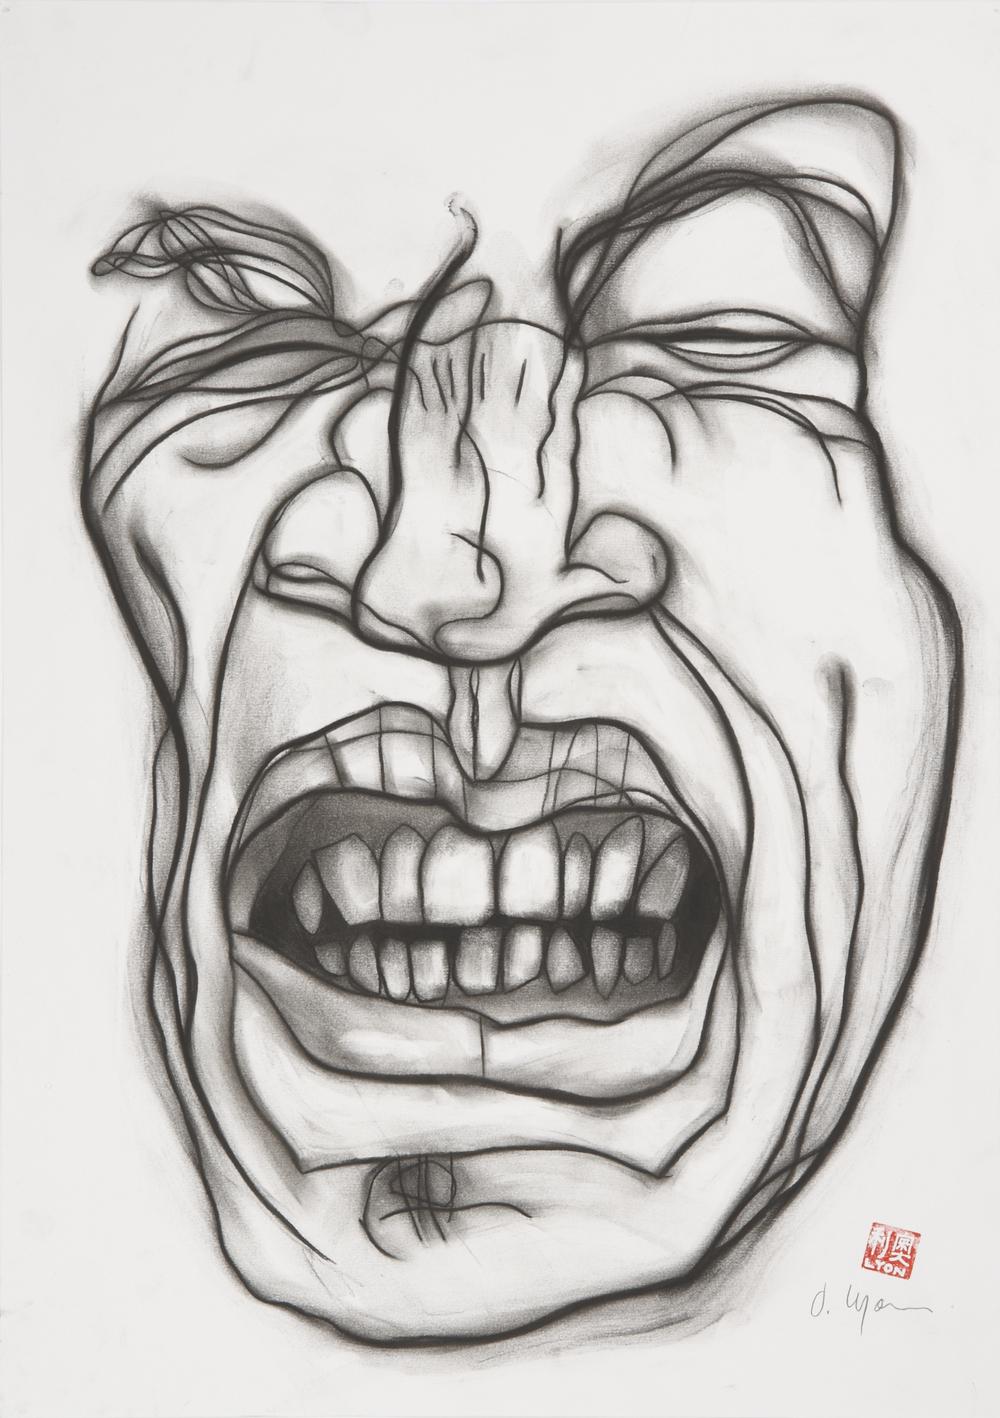 Portrait Mask Caricature 3 - 013 - 150dpi.jpg